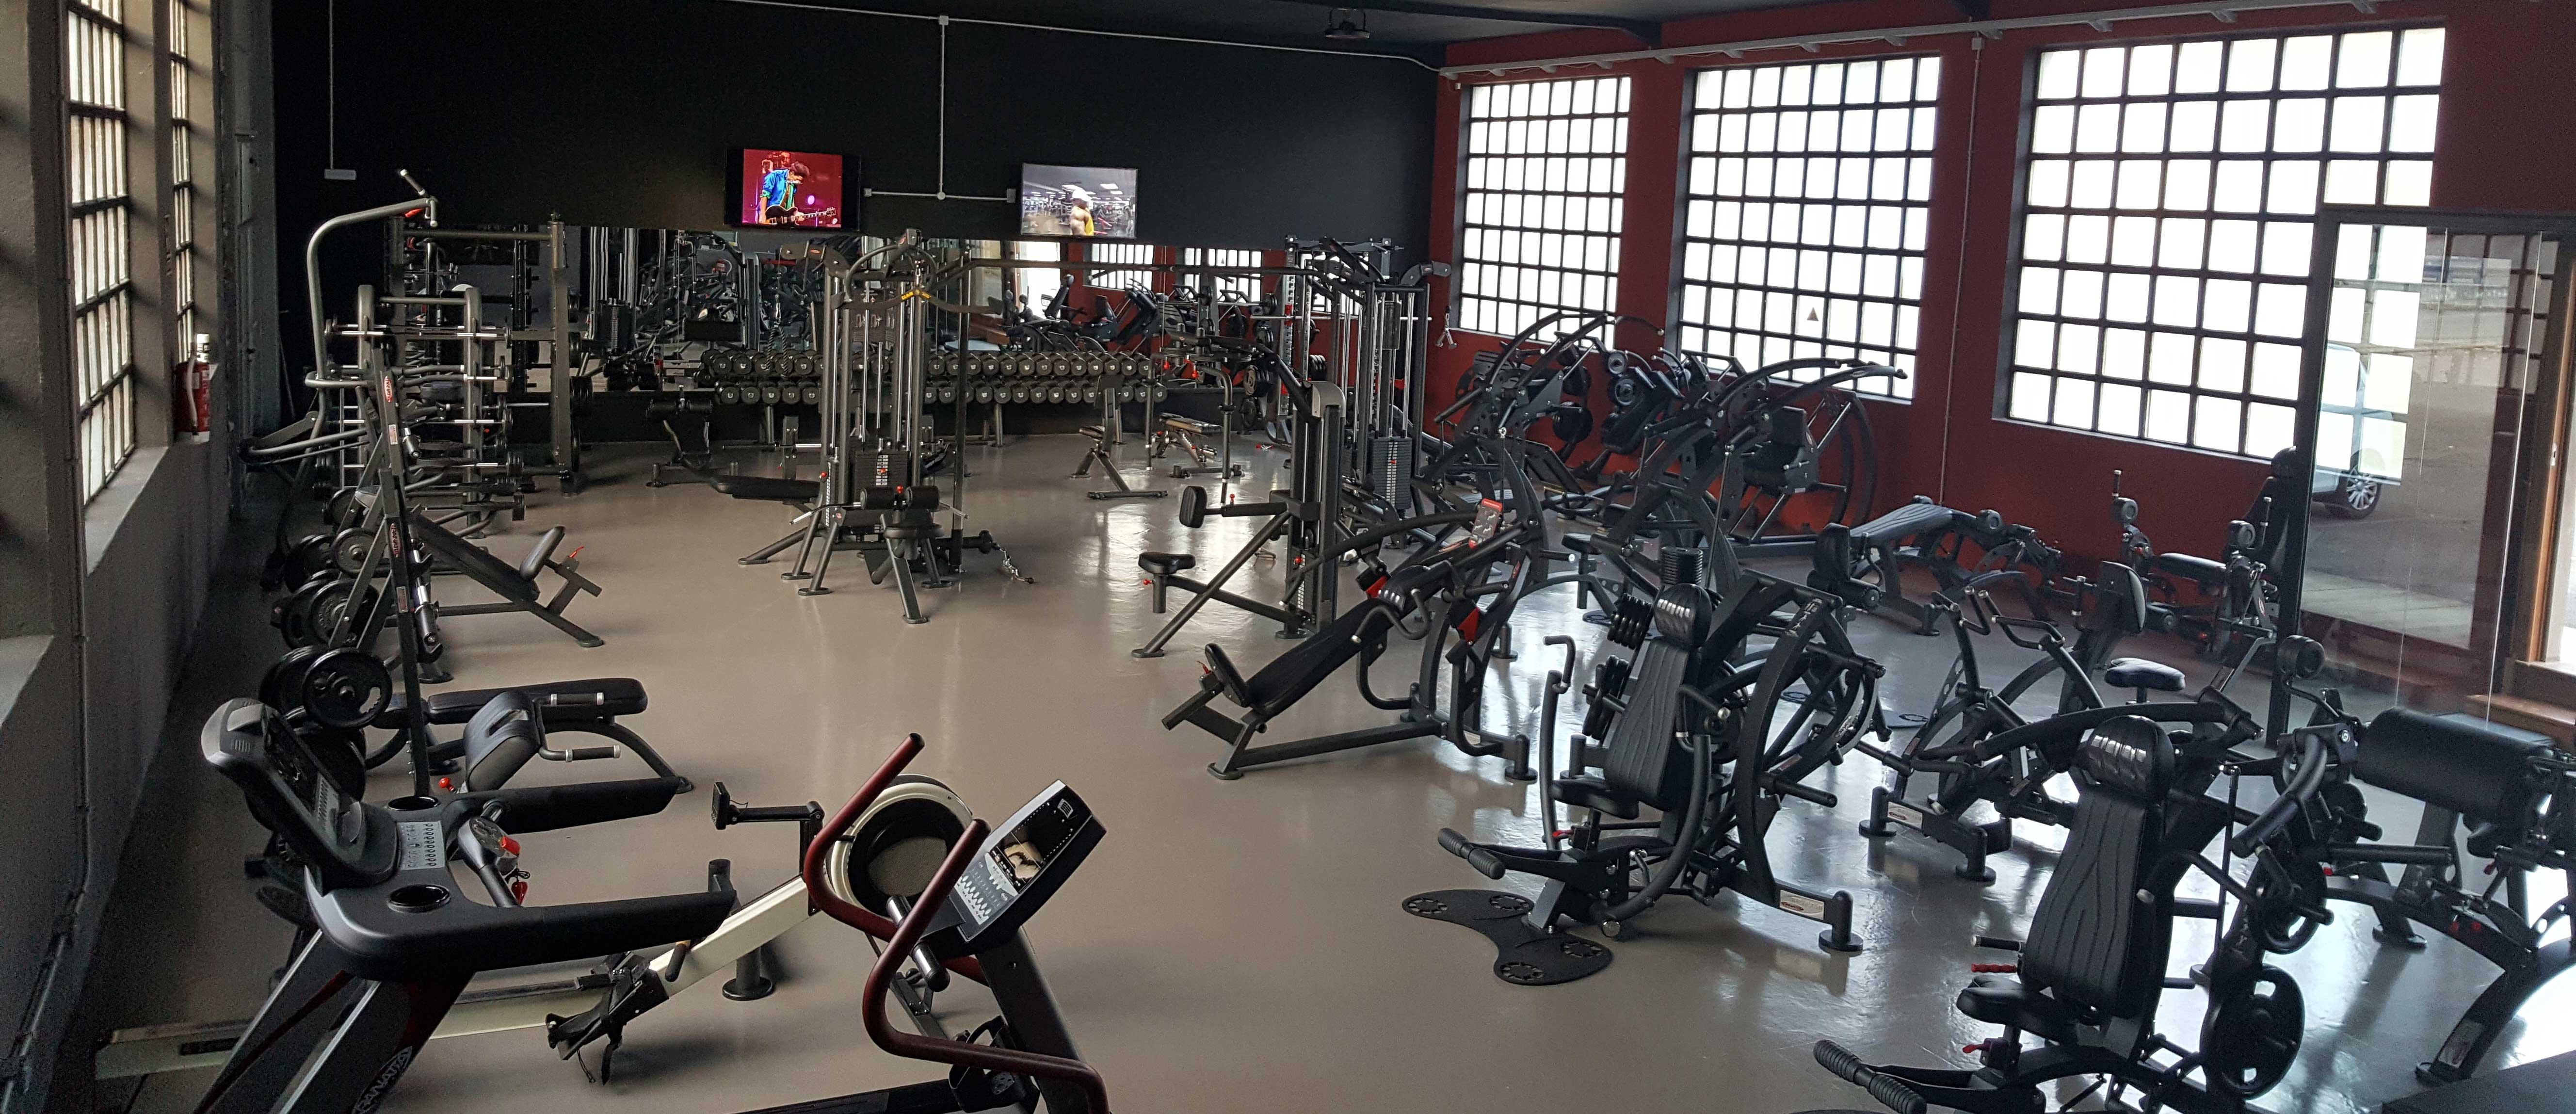 steel gimn s tu gimnasio de musculaci n en terrassa